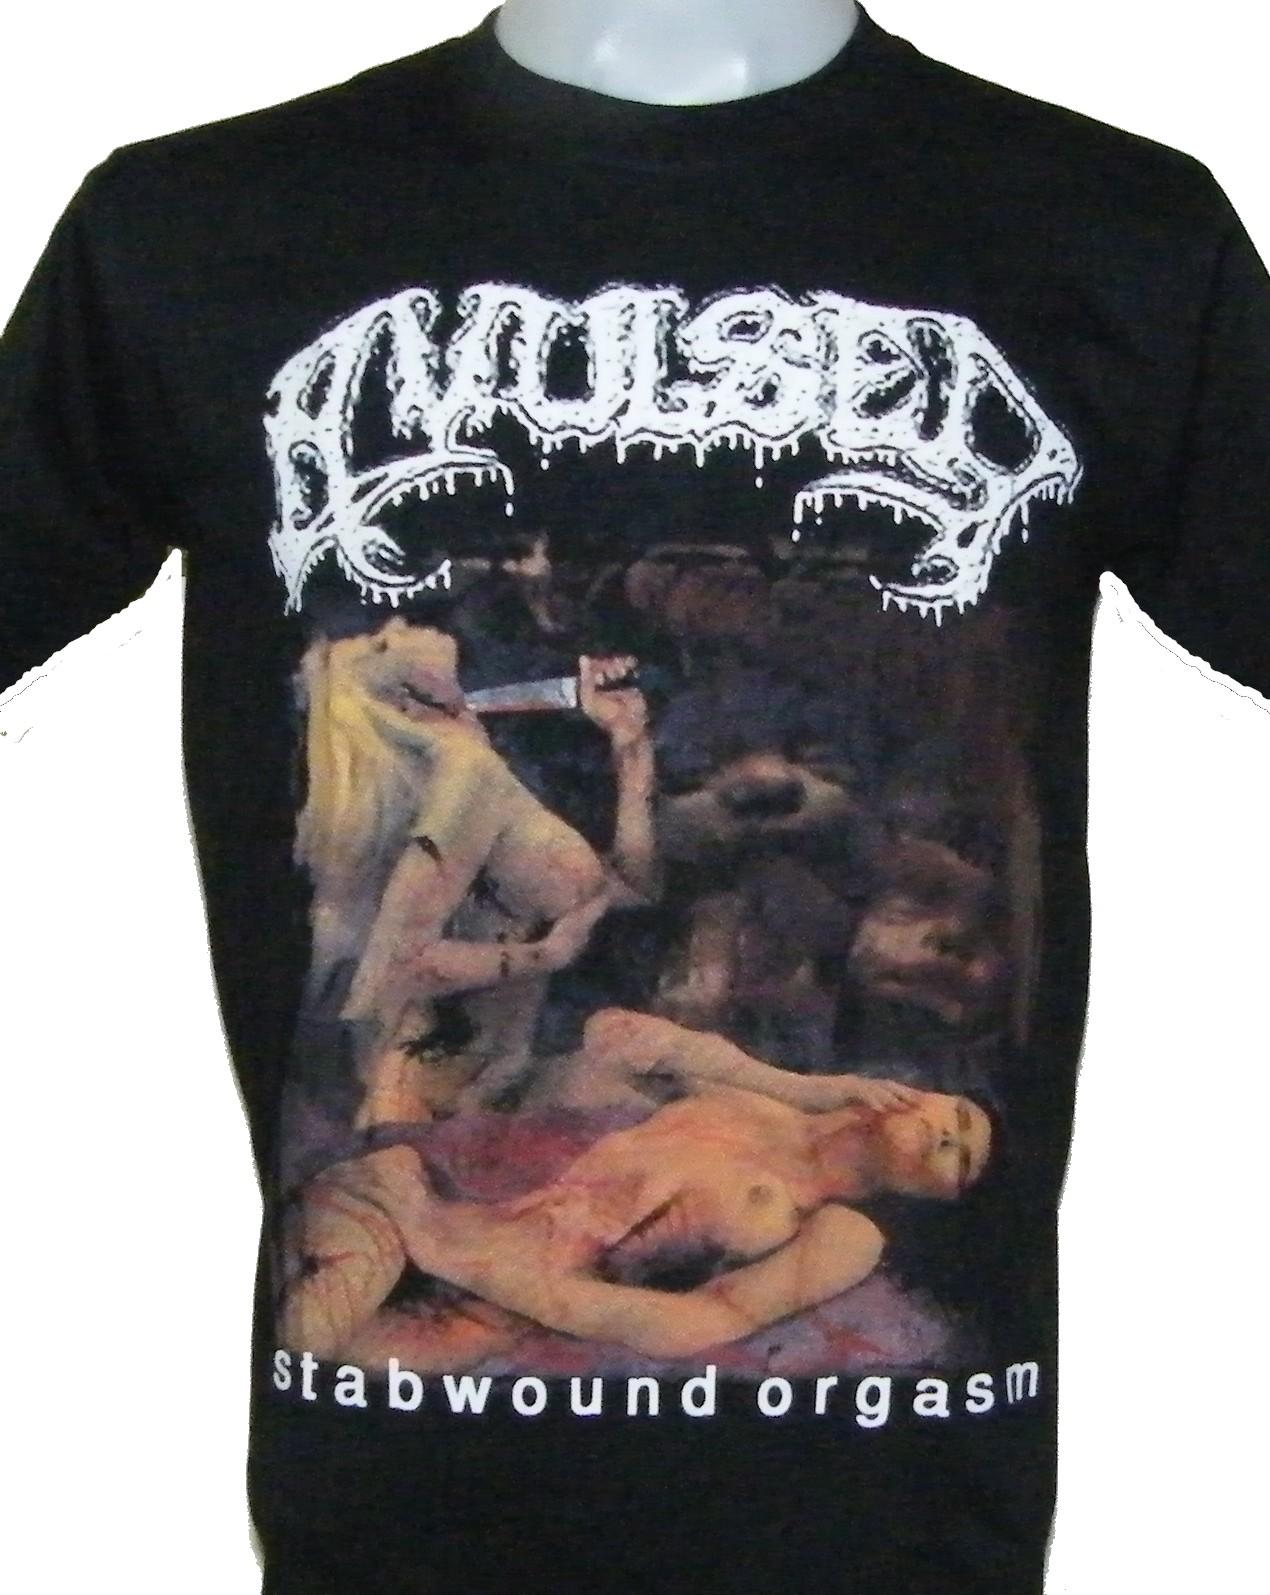 0bc239586 Avulsed t-shirt Stabwound Orgasm size M – RoxxBKK